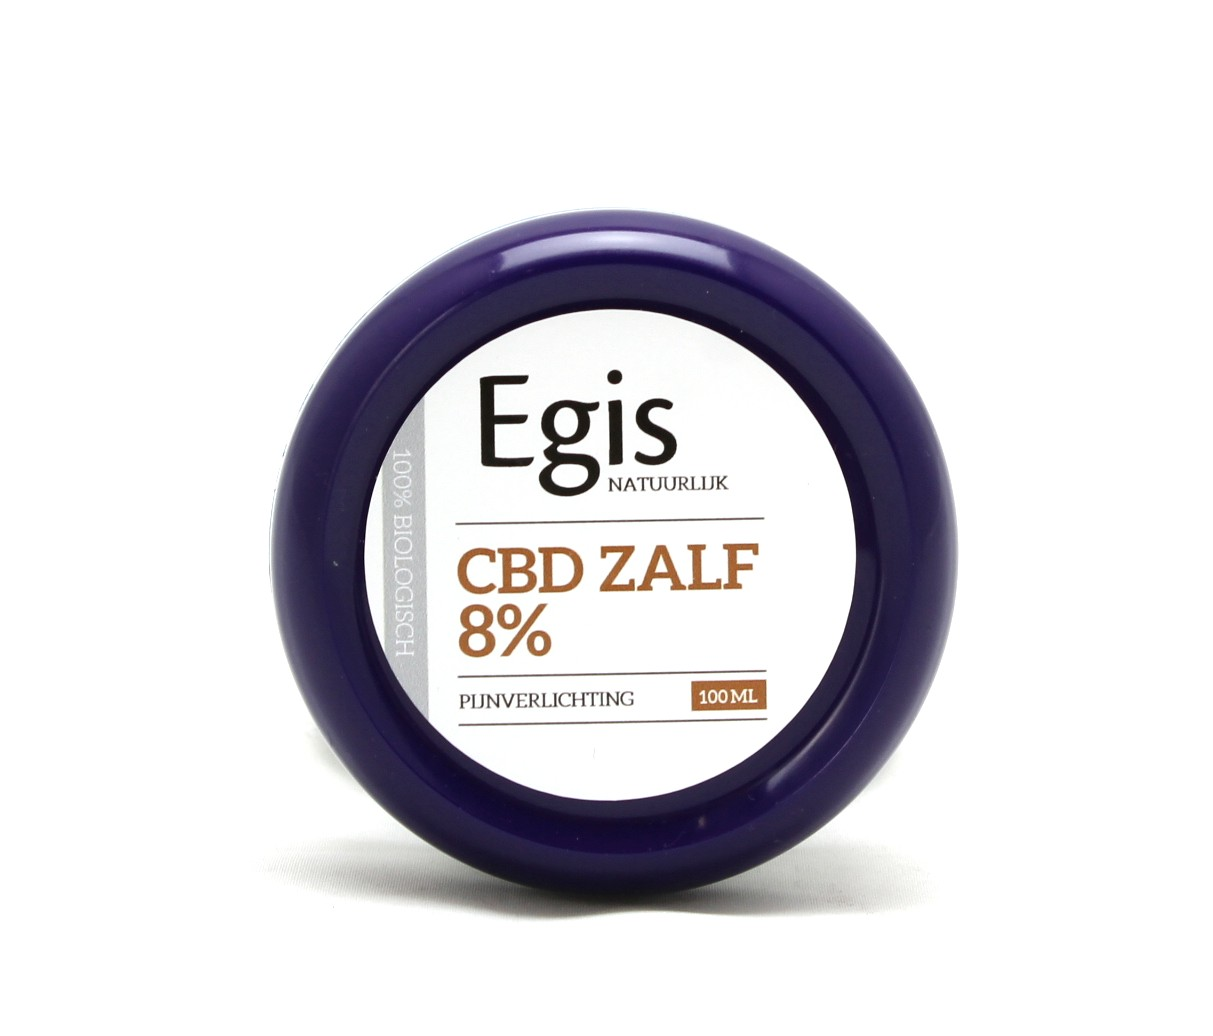 Egis CBD Zalf